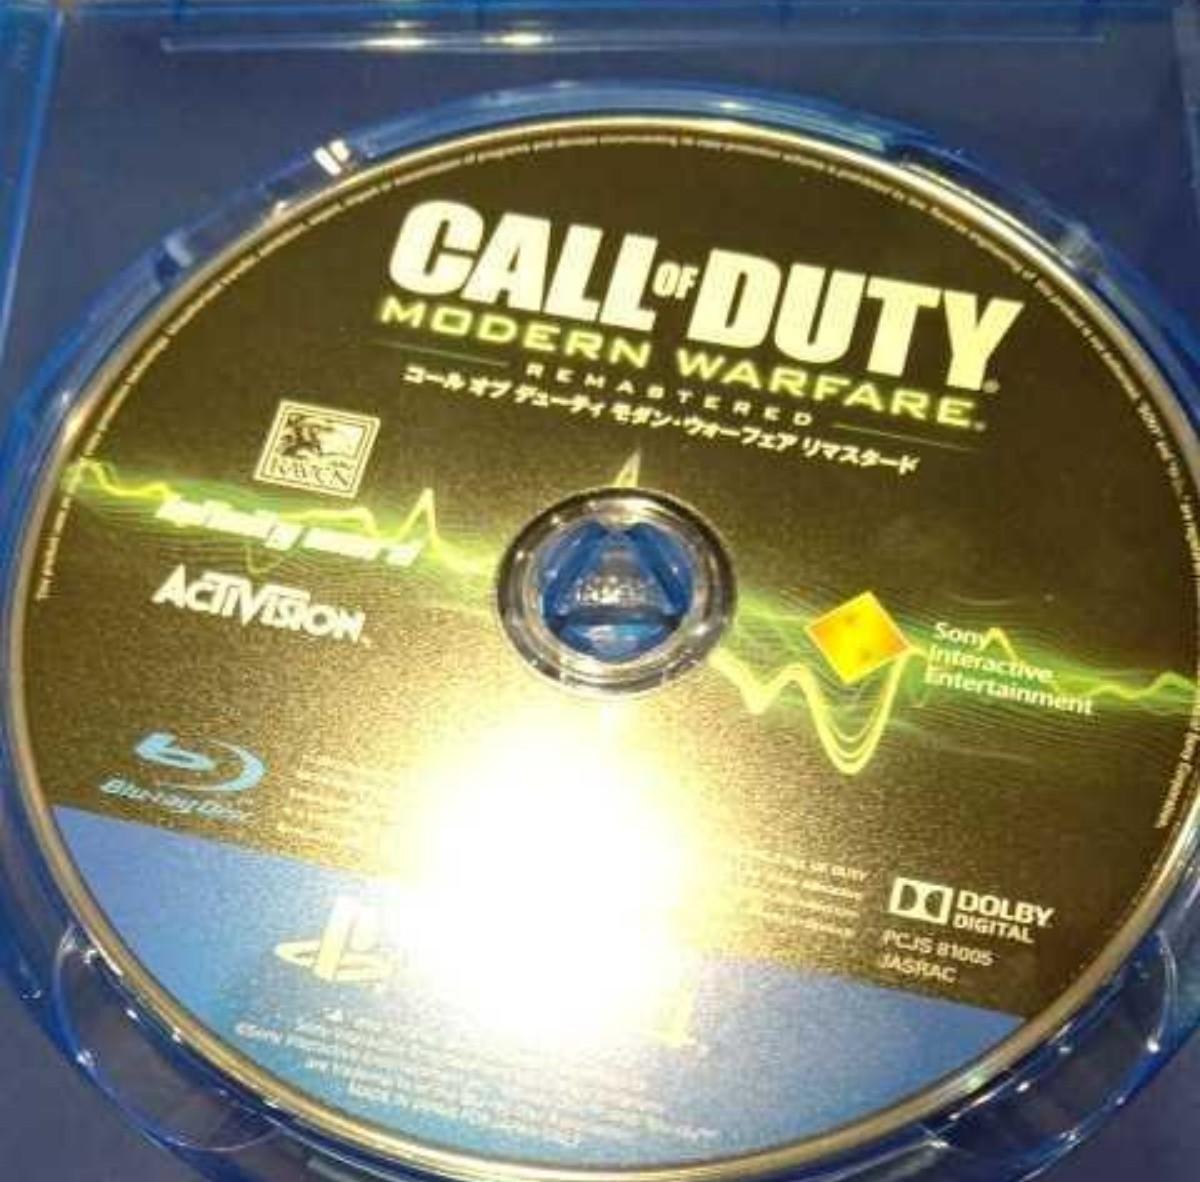 PS4 コールオブデューティ モダンウォーフェア リマスタード 送料無料 リマスター COD MW CALL OF DUTY